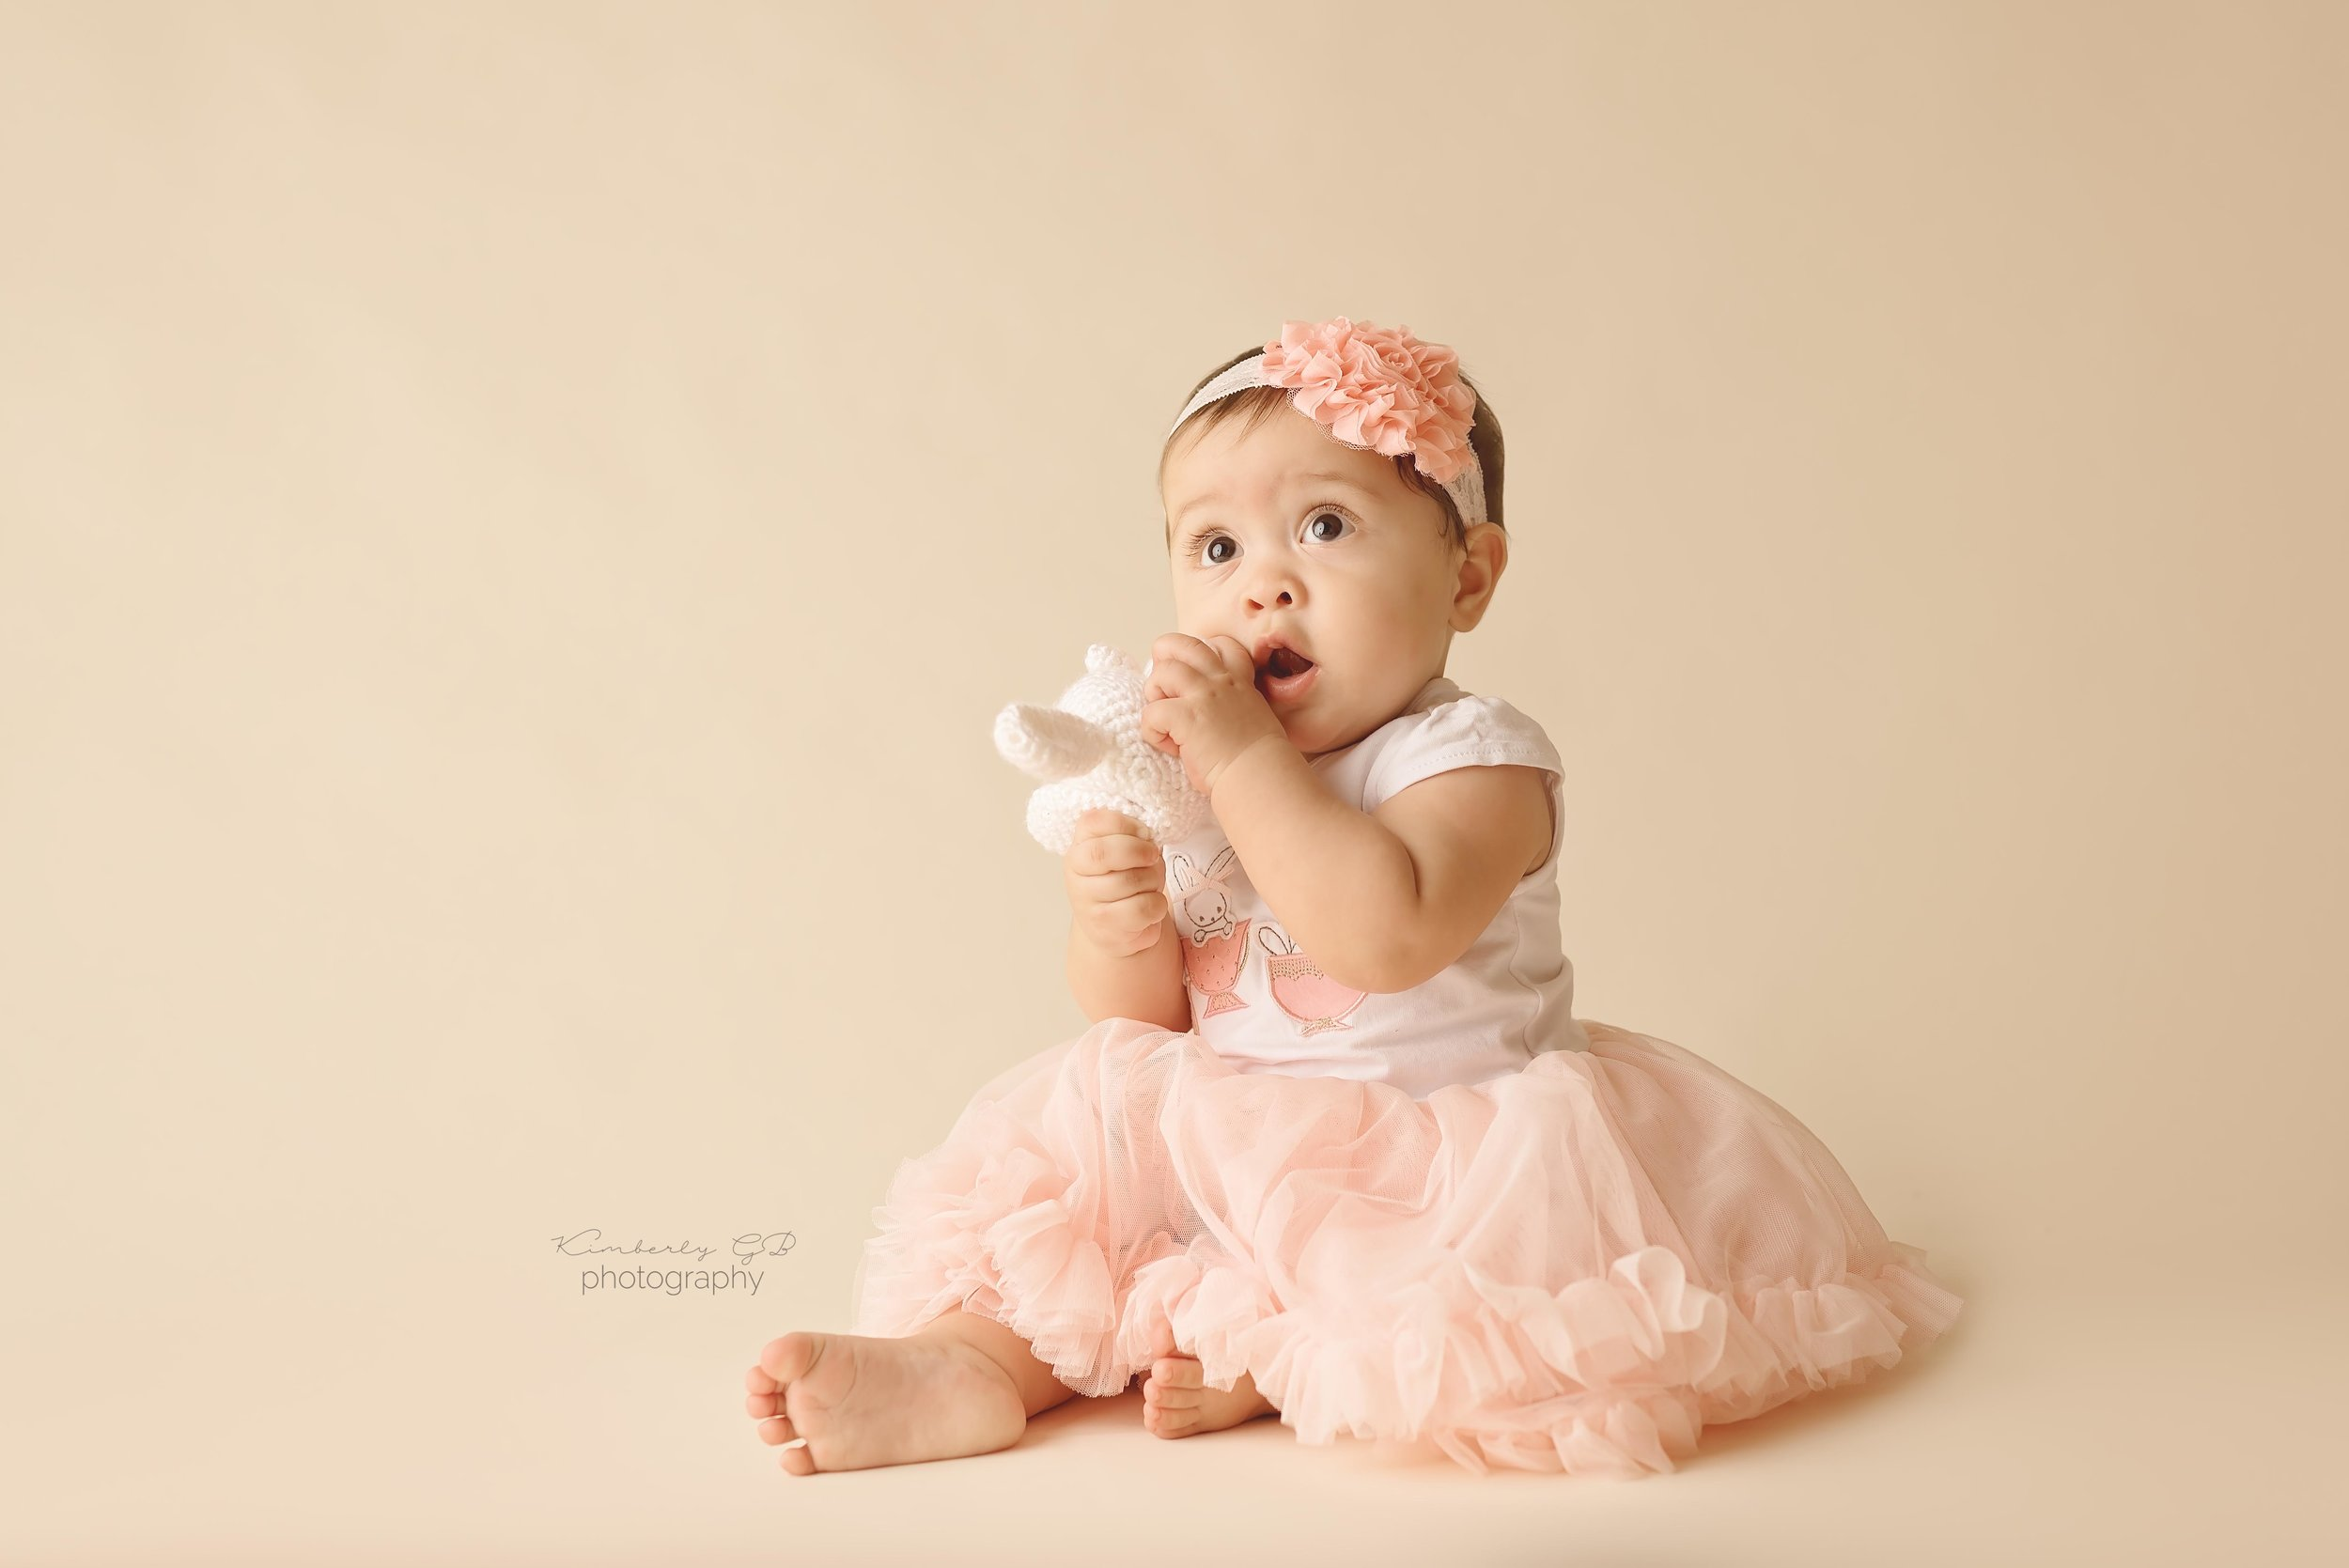 fotografia-de-ninos-bebes-kids-children-en-puerto-rico-kimberly-gb-photography-fotografa-50.jpg